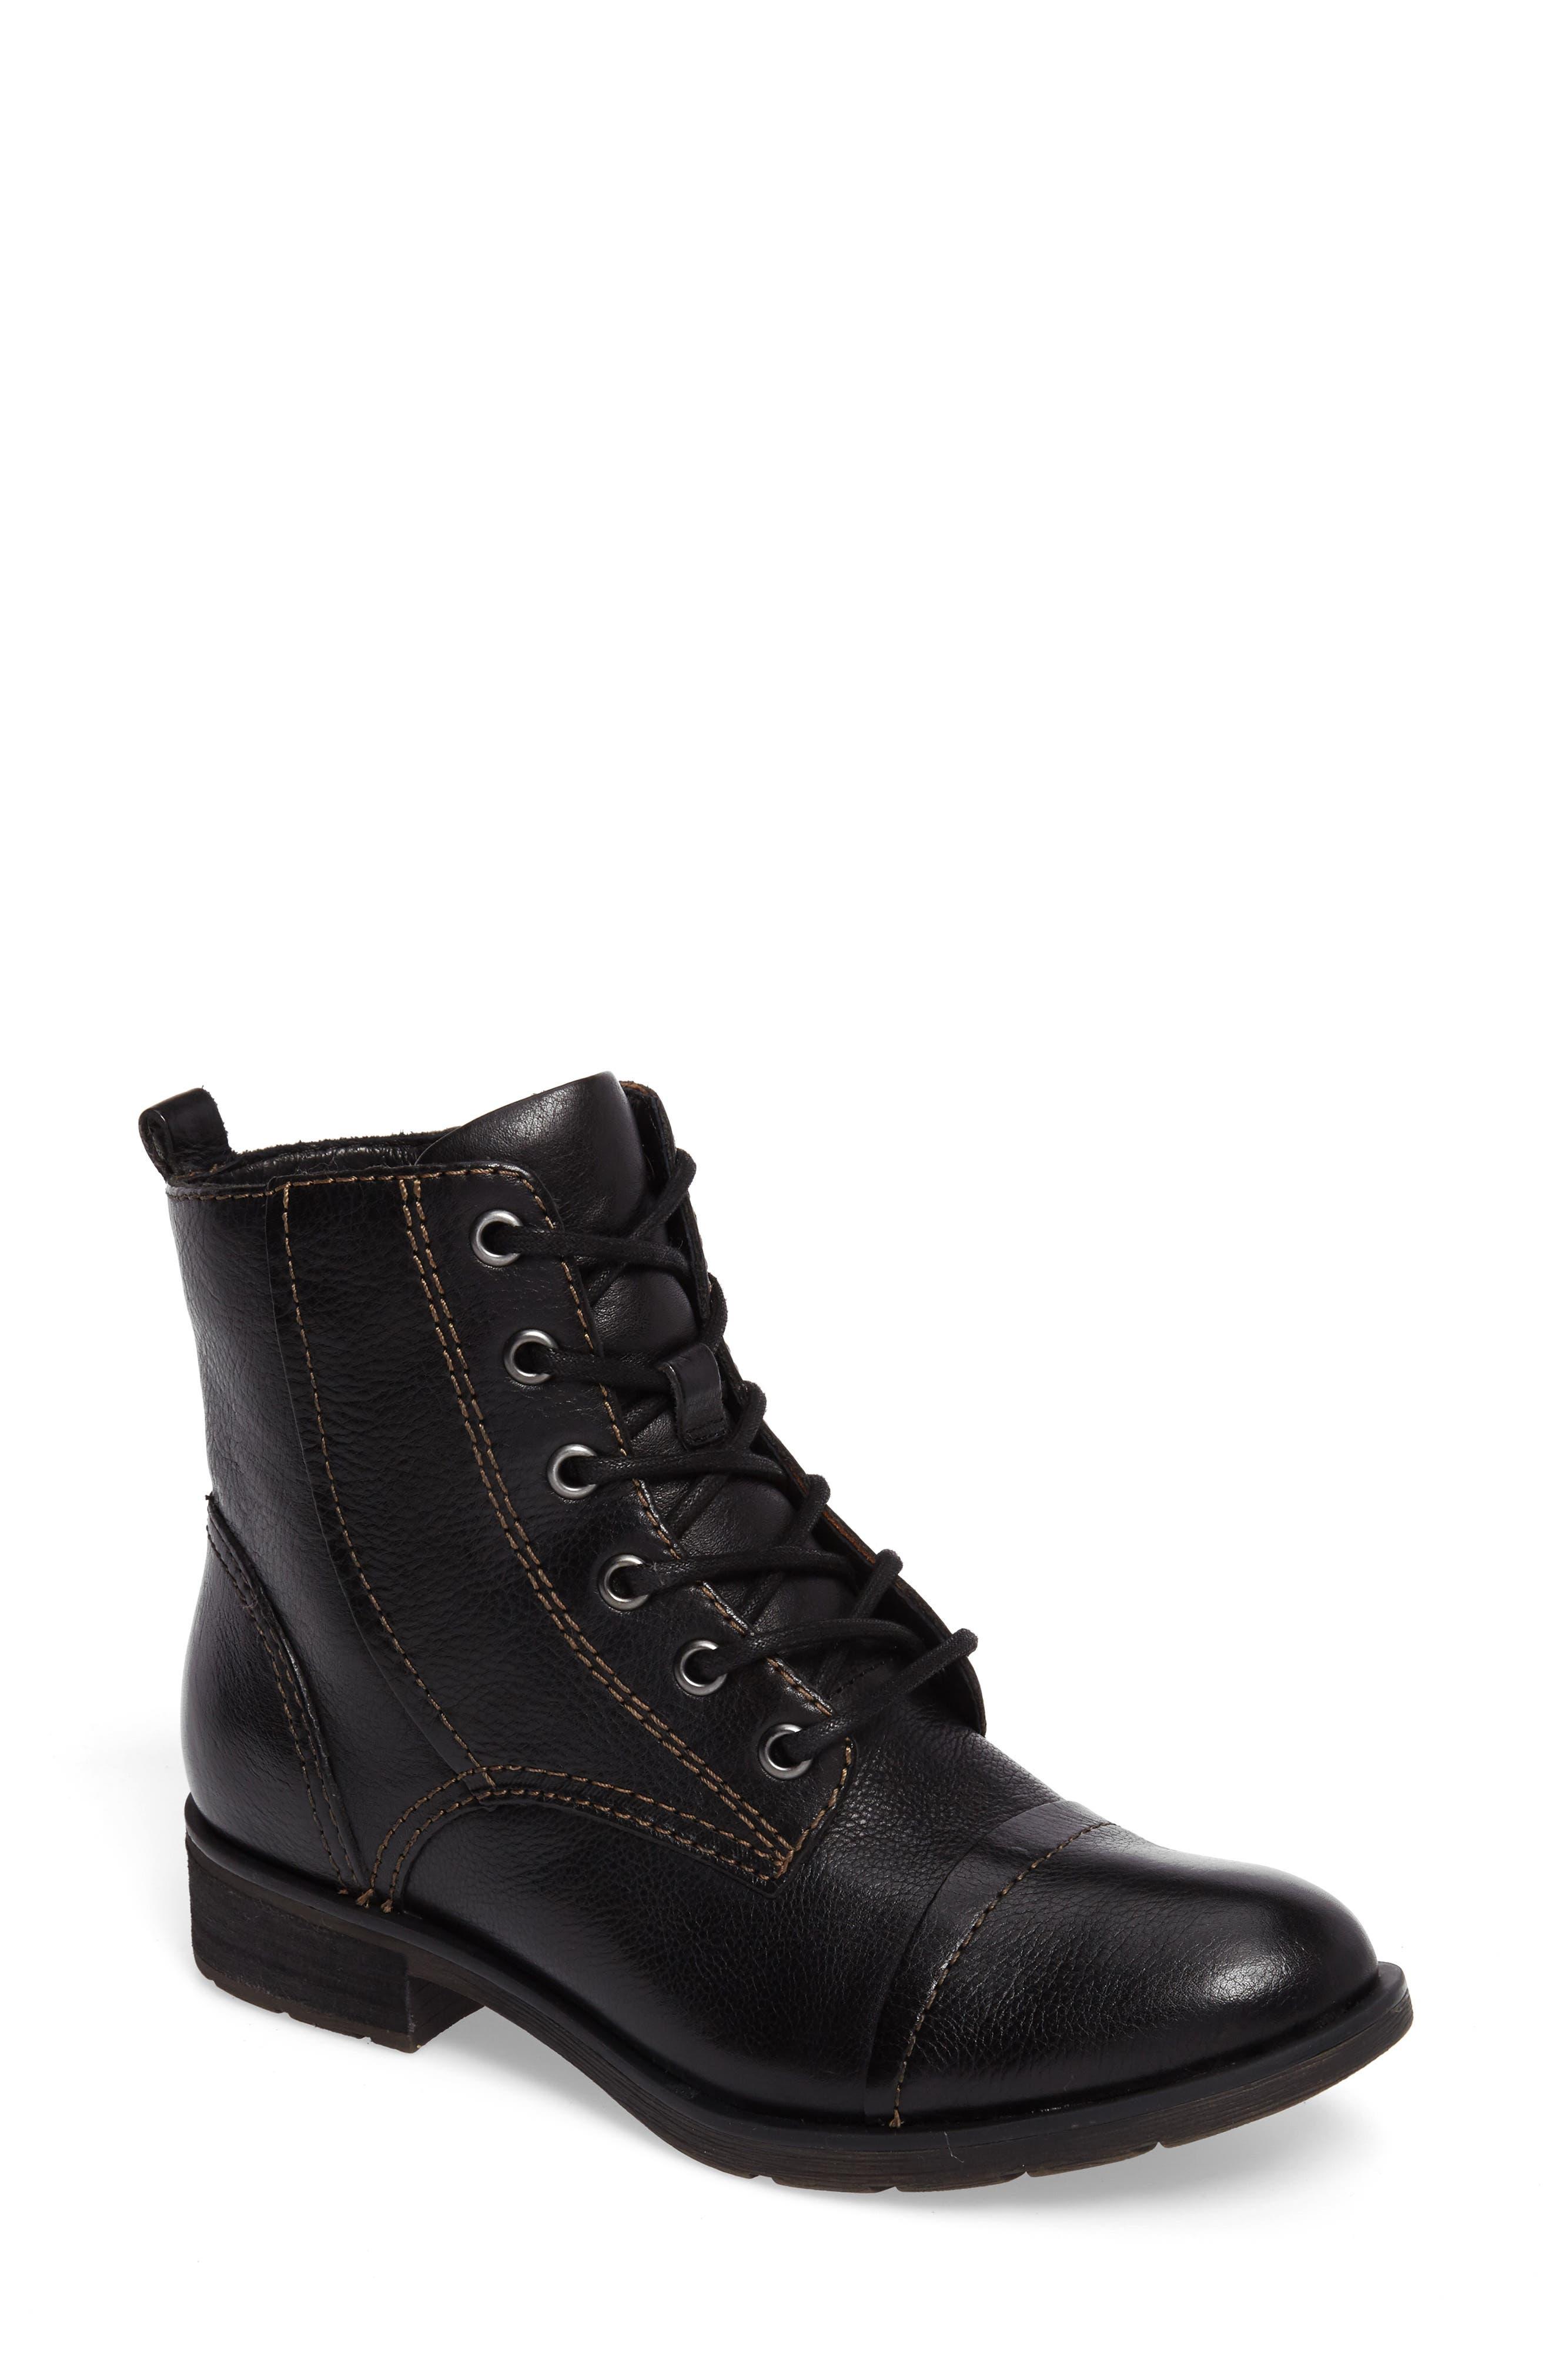 Main Image - Söfft Belton Cap Toe Combat Boot (Women)